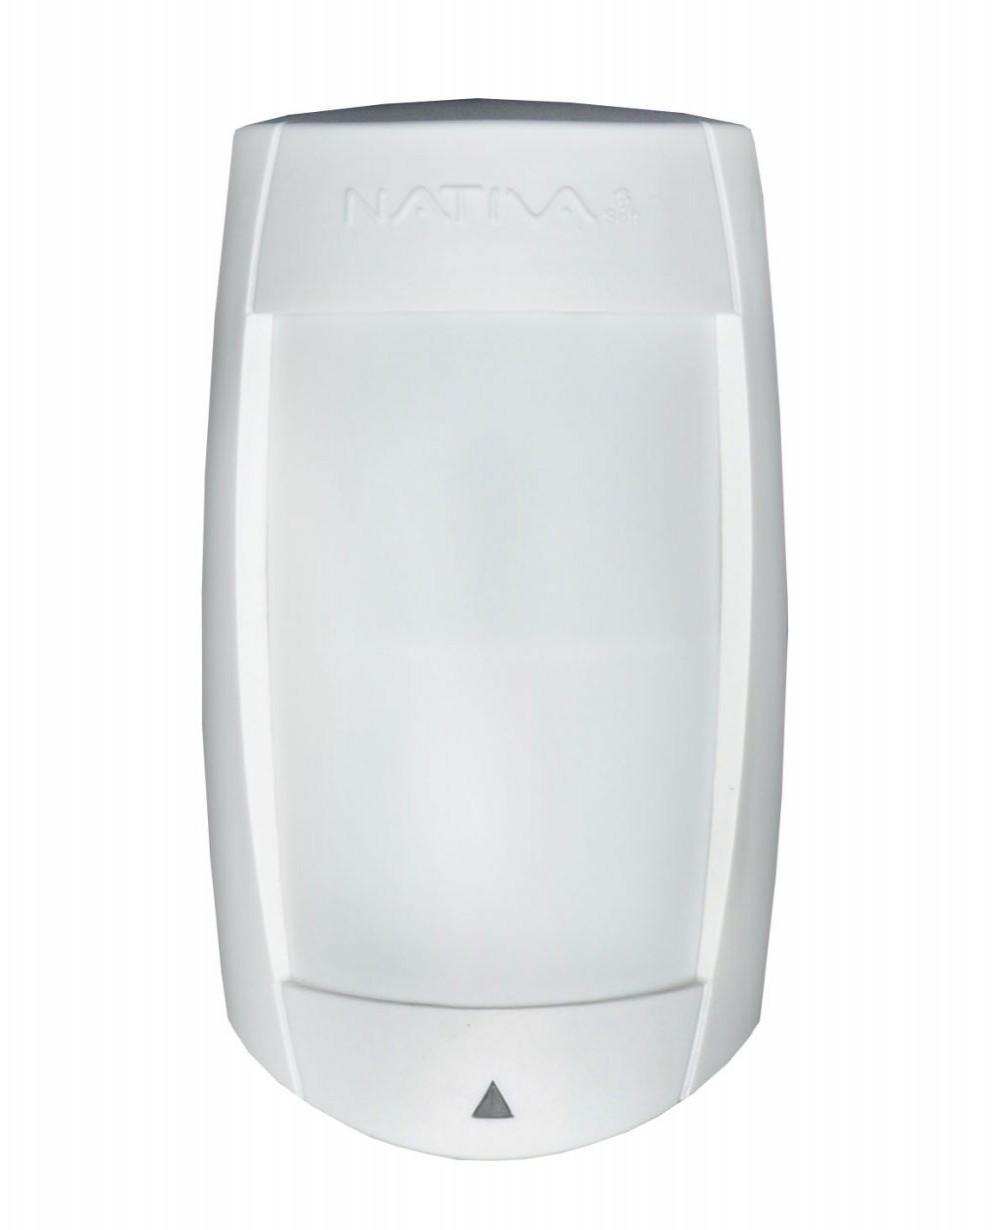 Sensor Nativa NT-75